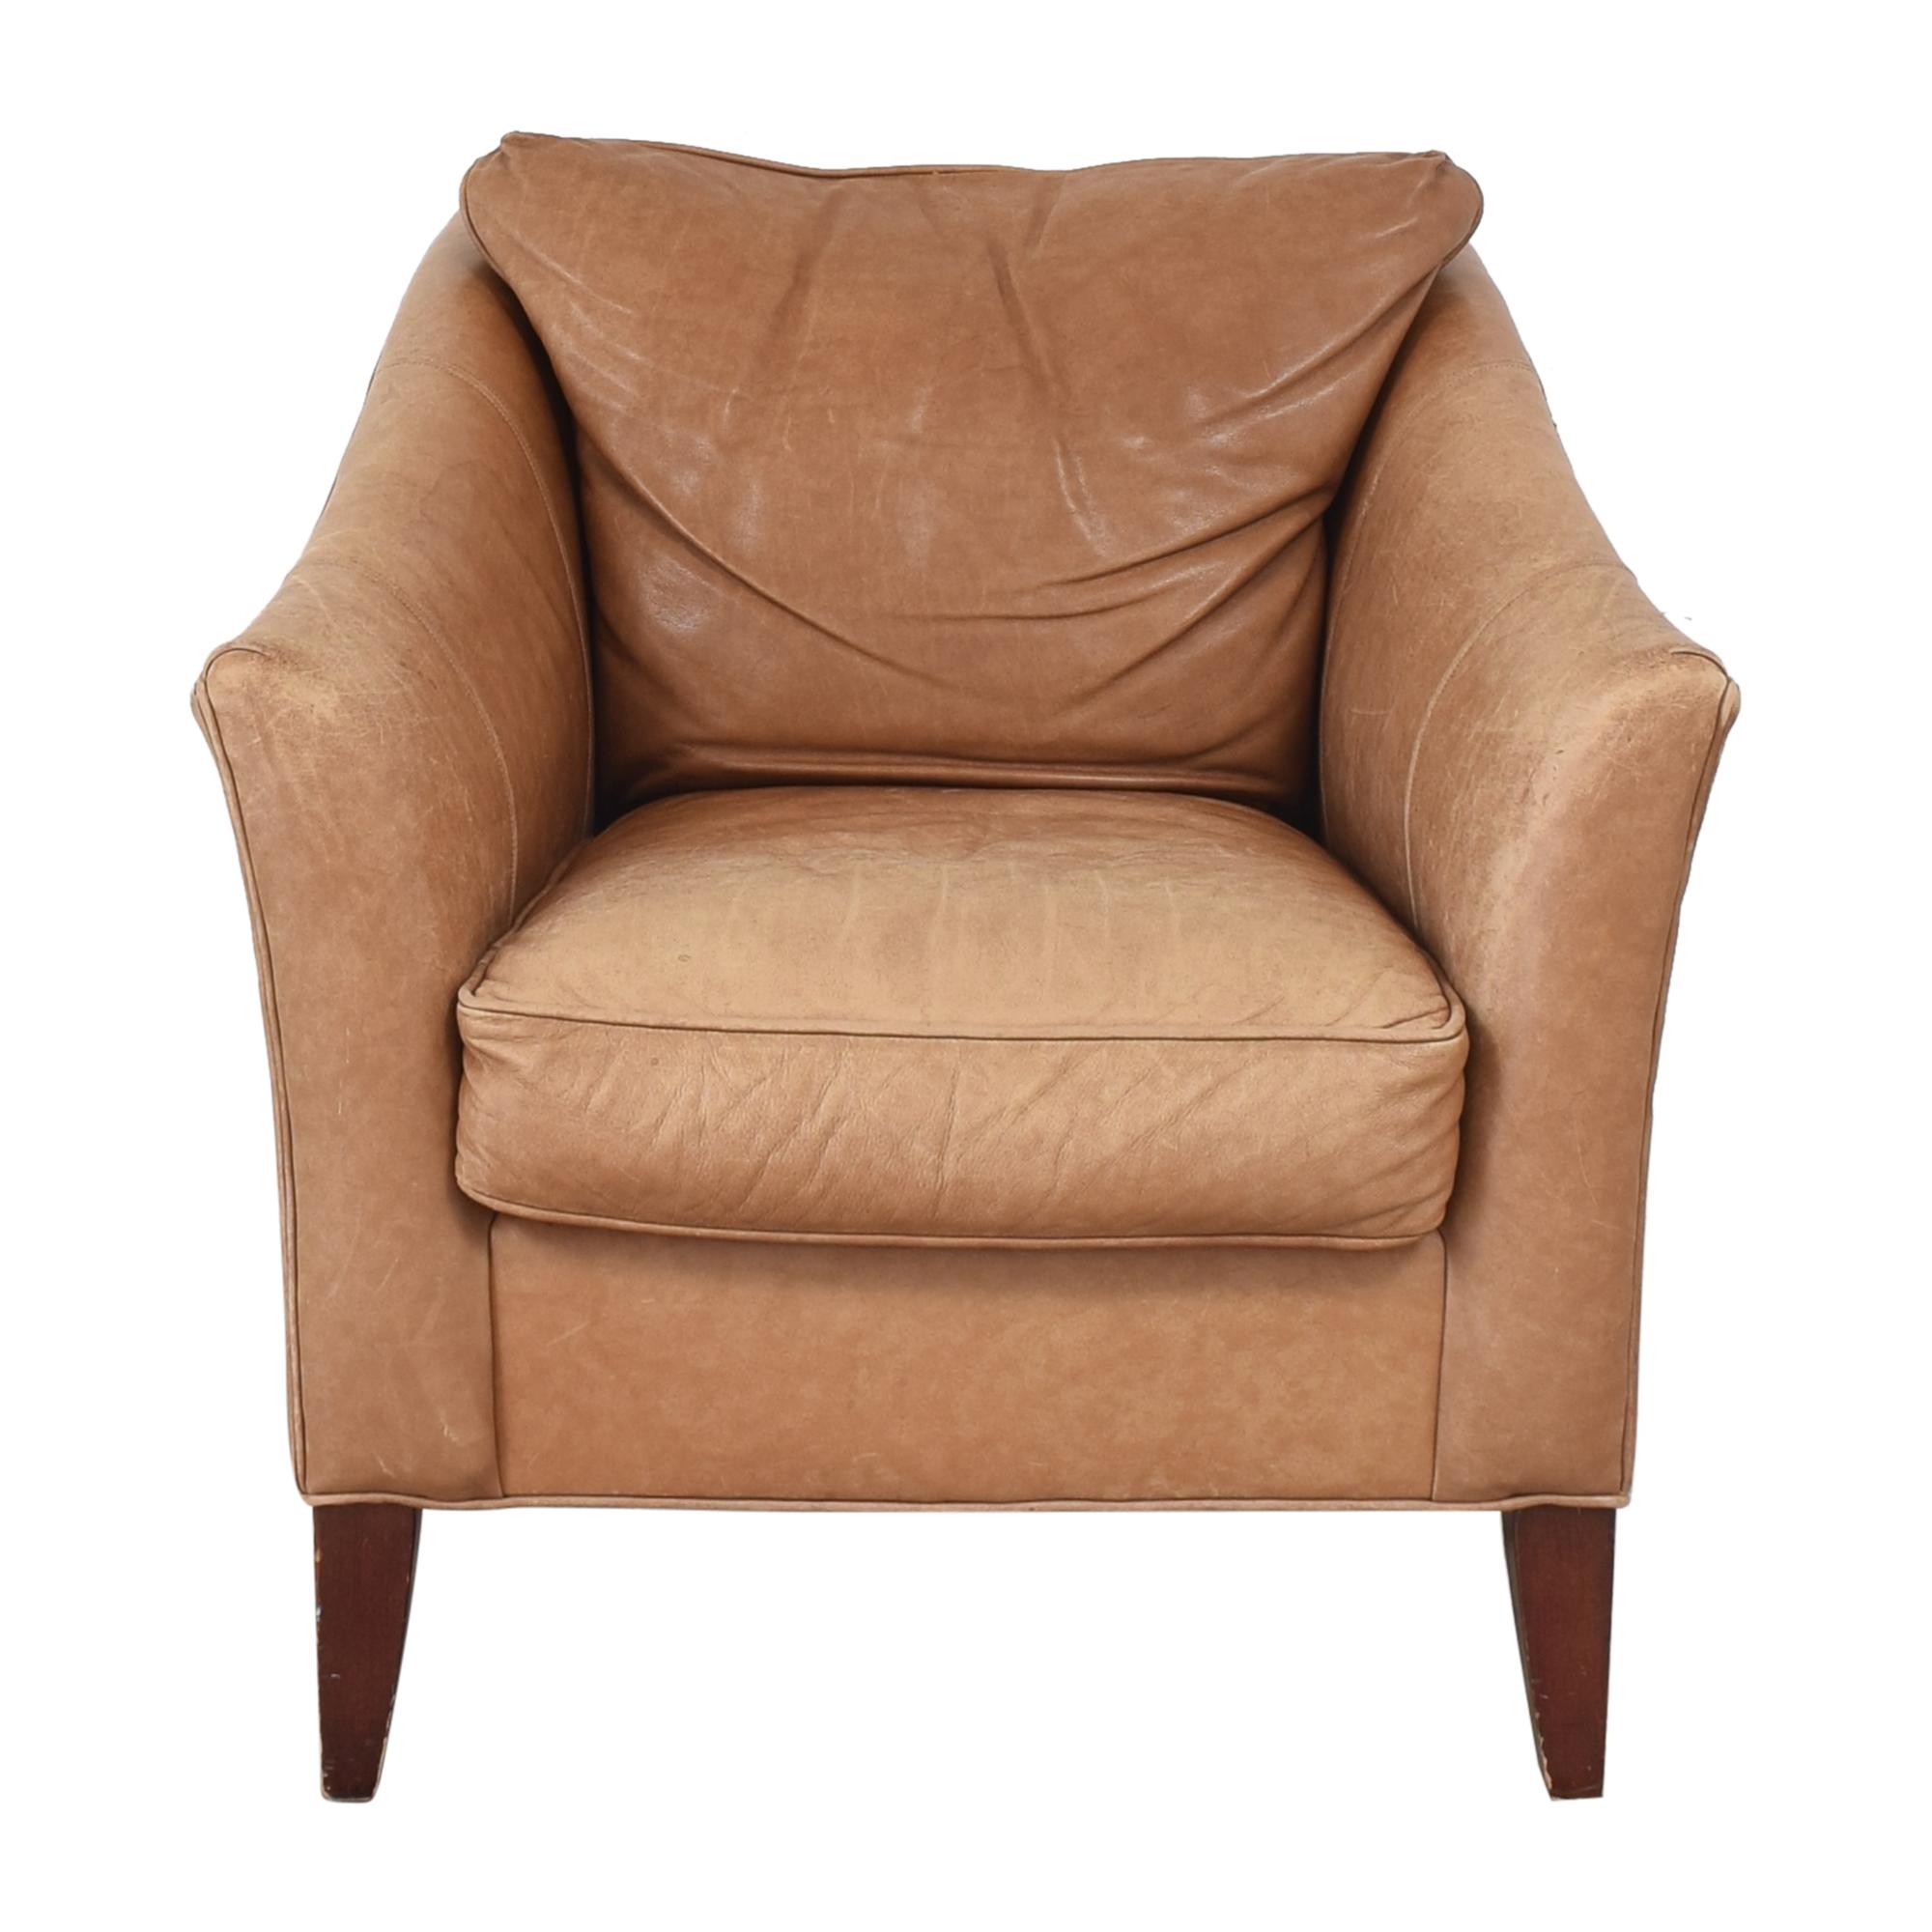 buy Ethan Allen Ethan Allen Flare Arm Accent Chair online